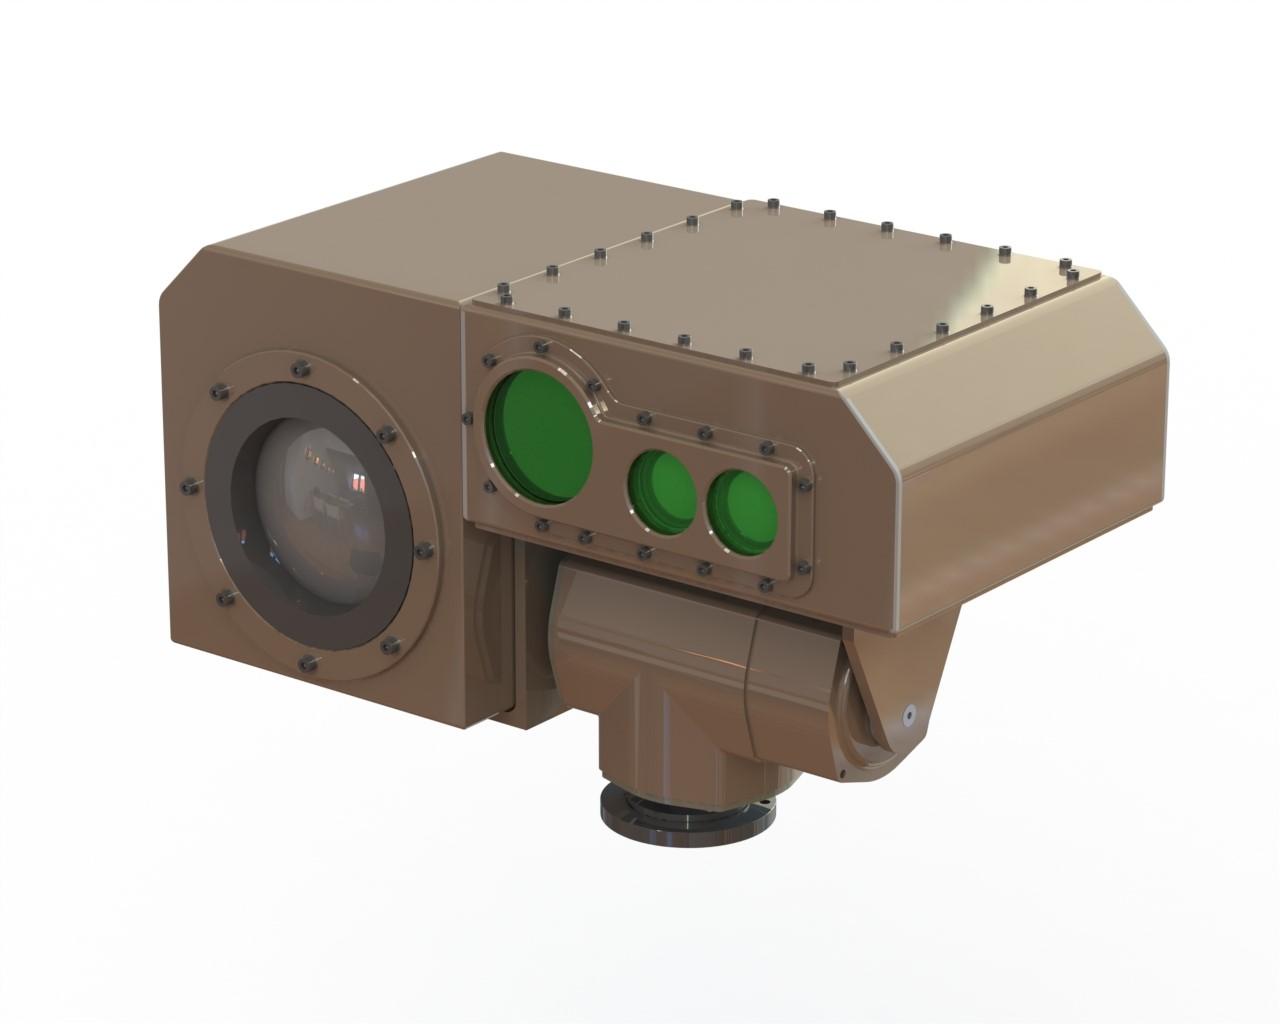 Firefly CMSLRF01